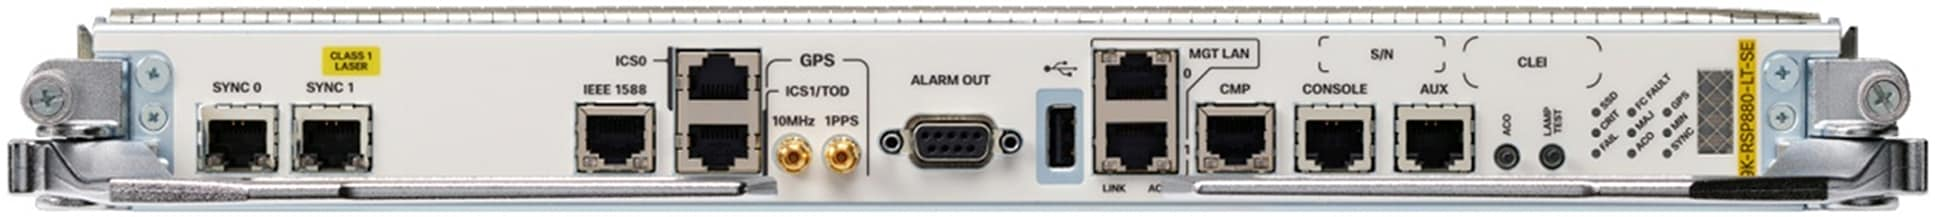 A9K-36X10GE-SE Compatible SFP-10G-LR for Cisco ASR 9000 Series